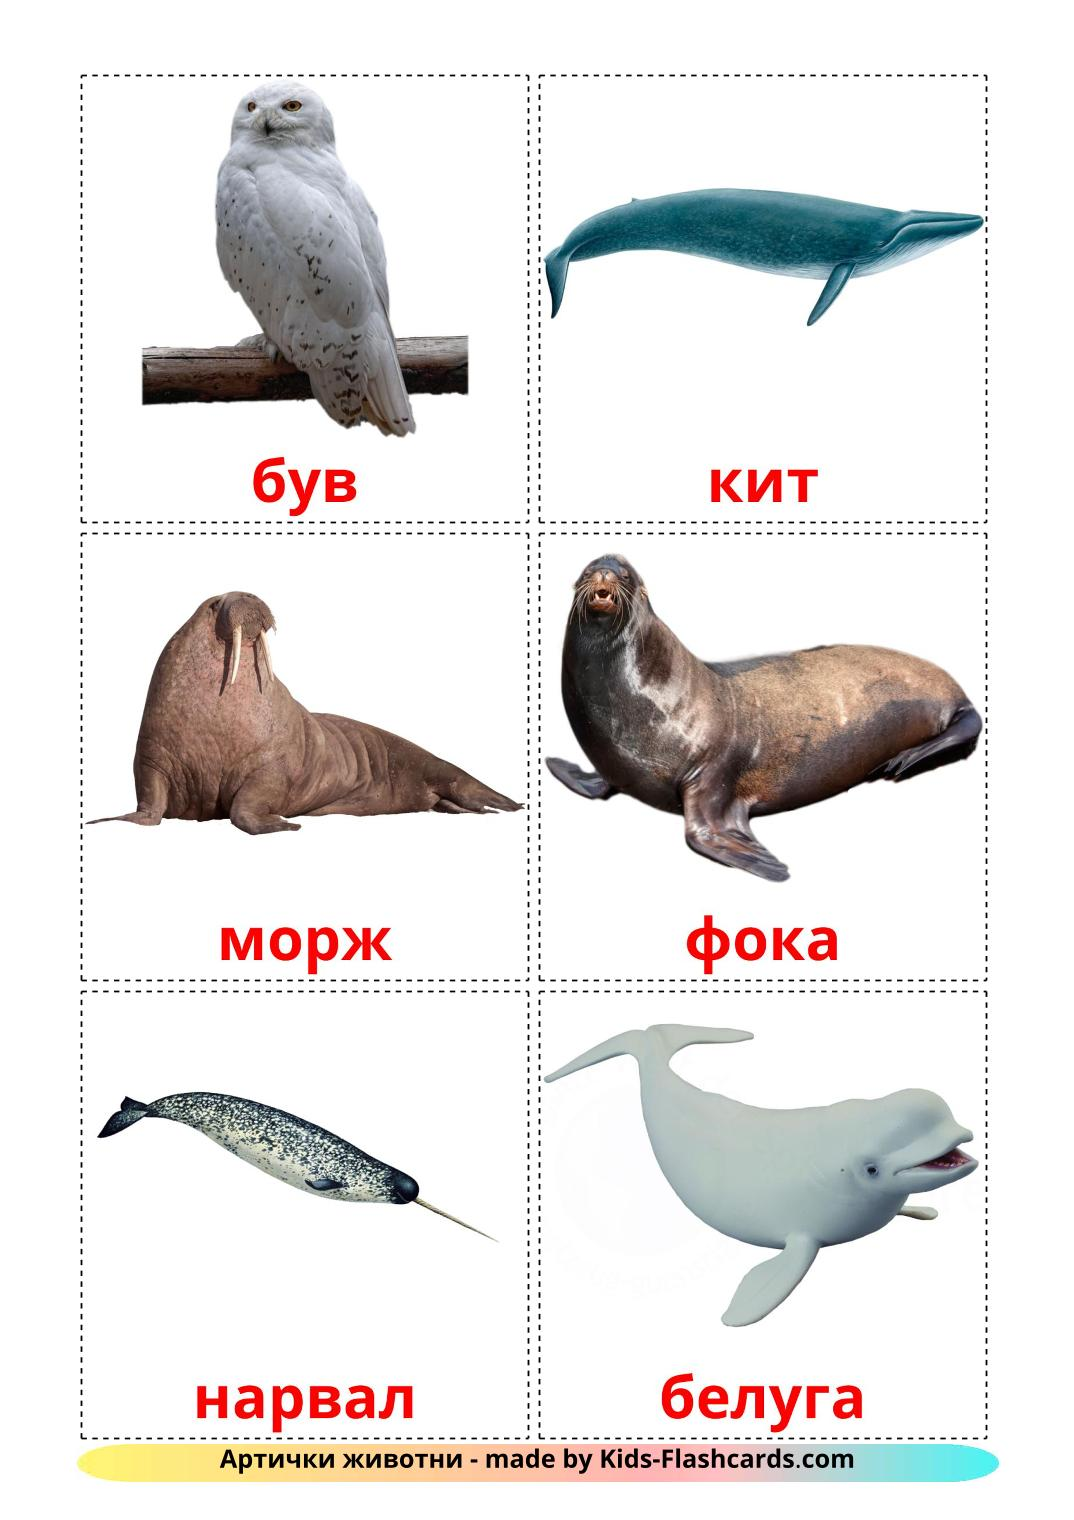 Arctic animals - 14 Free Printable macedonian Flashcards